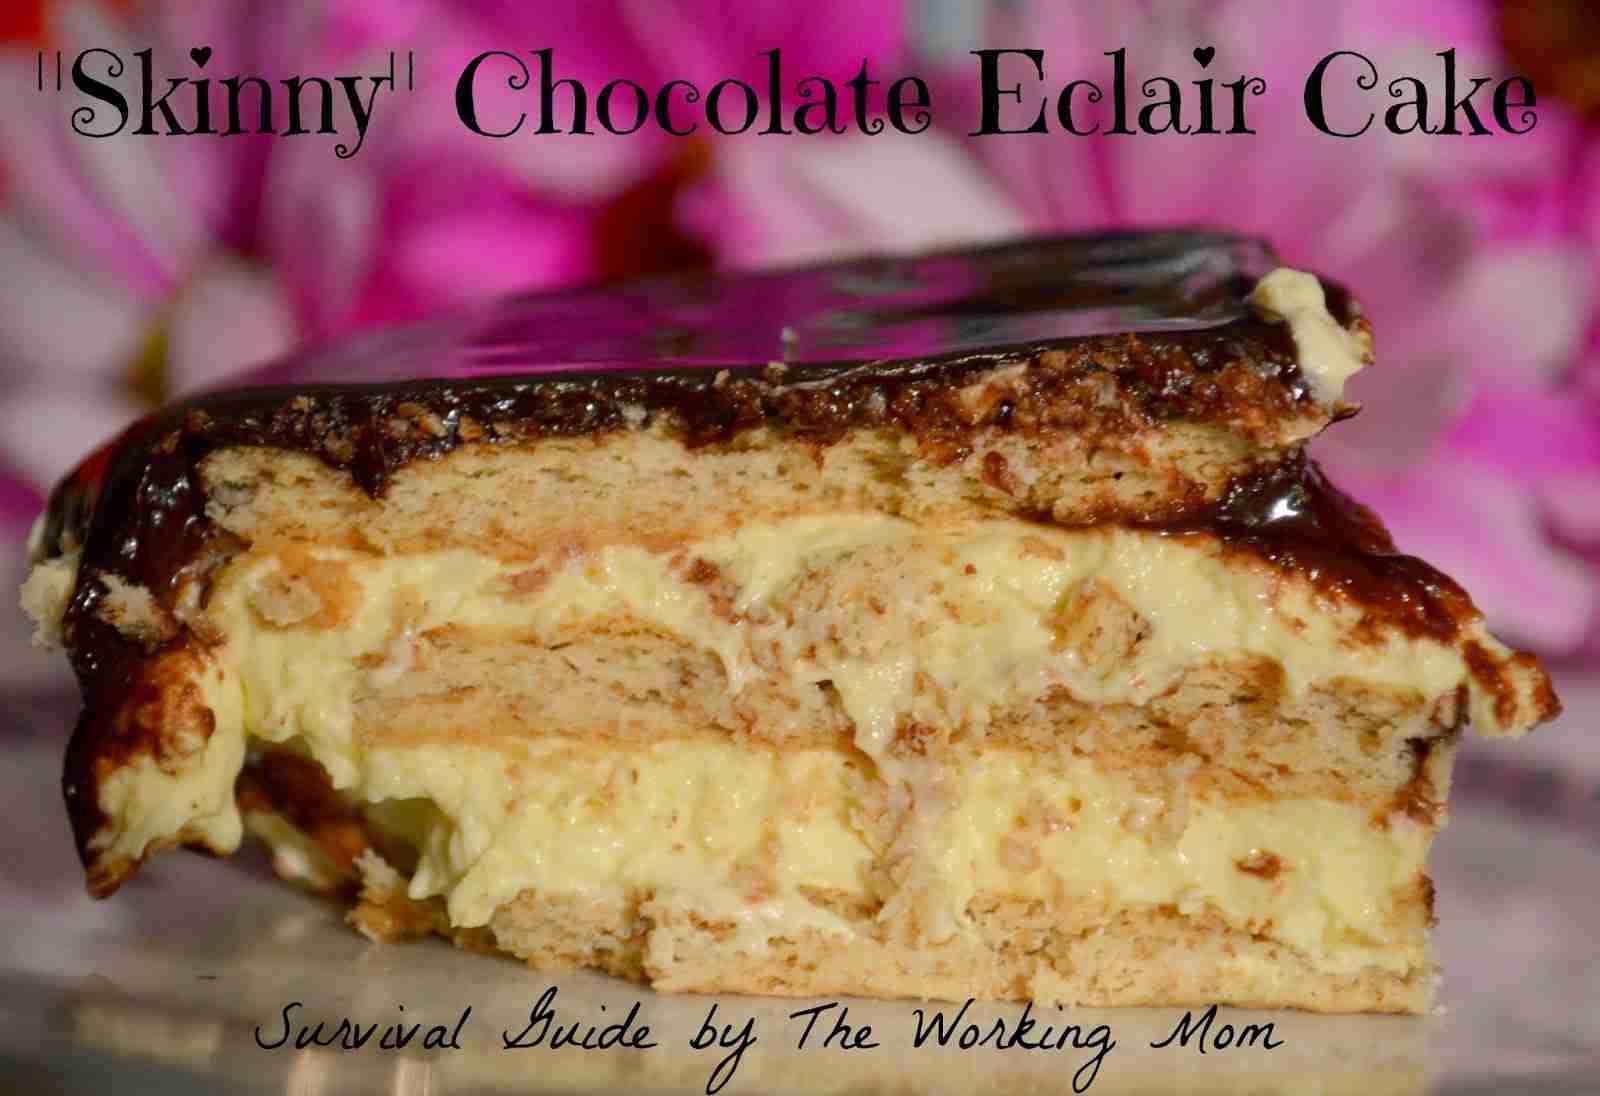 skinny eclair cake recipe